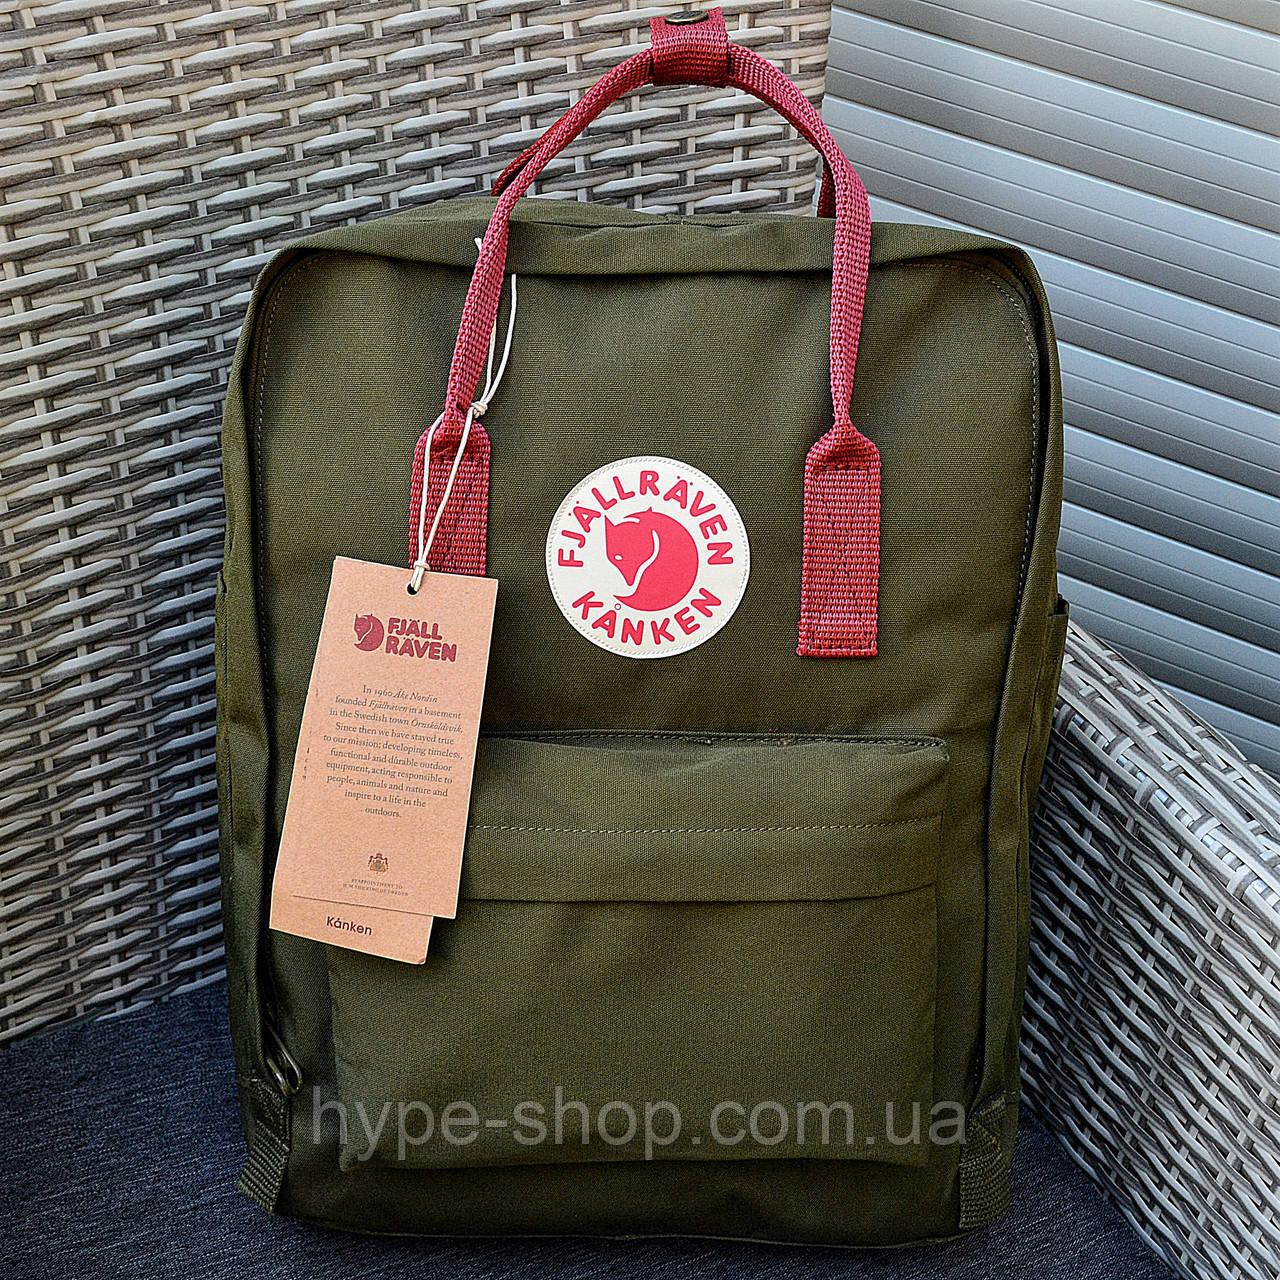 Портфель Kanken Classic 16 L рюкзак канкен класік хакі з бордовими ручками канкен класік хакі